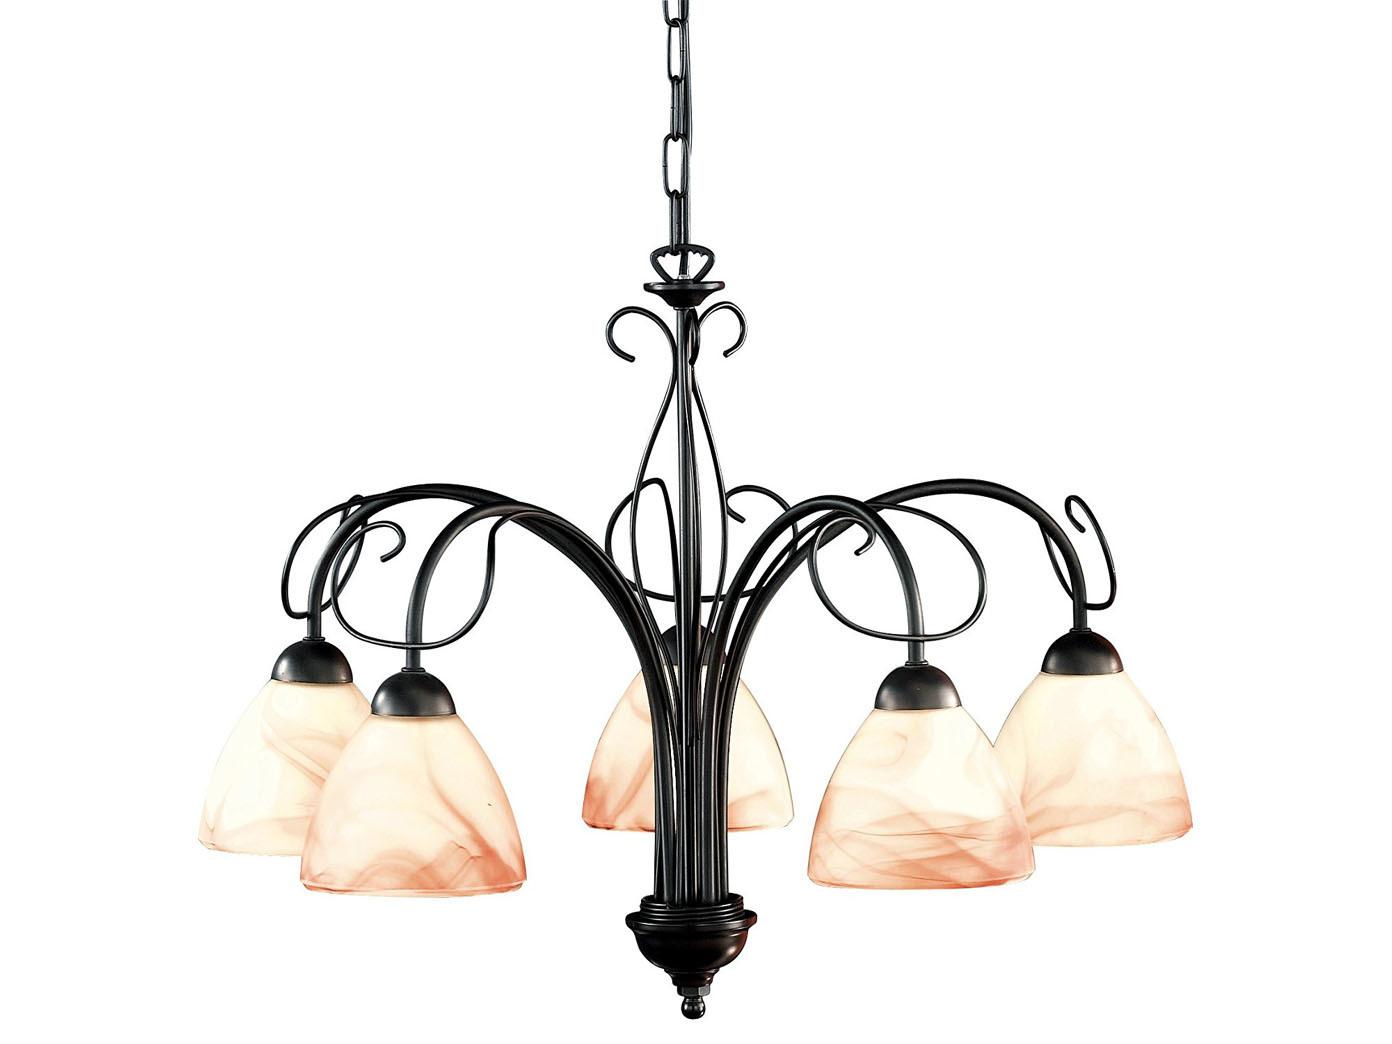 Haengeleuchter-Rostfarbig-antik-Glas-alabaster-Honsel-Leuchten-VENEZIA